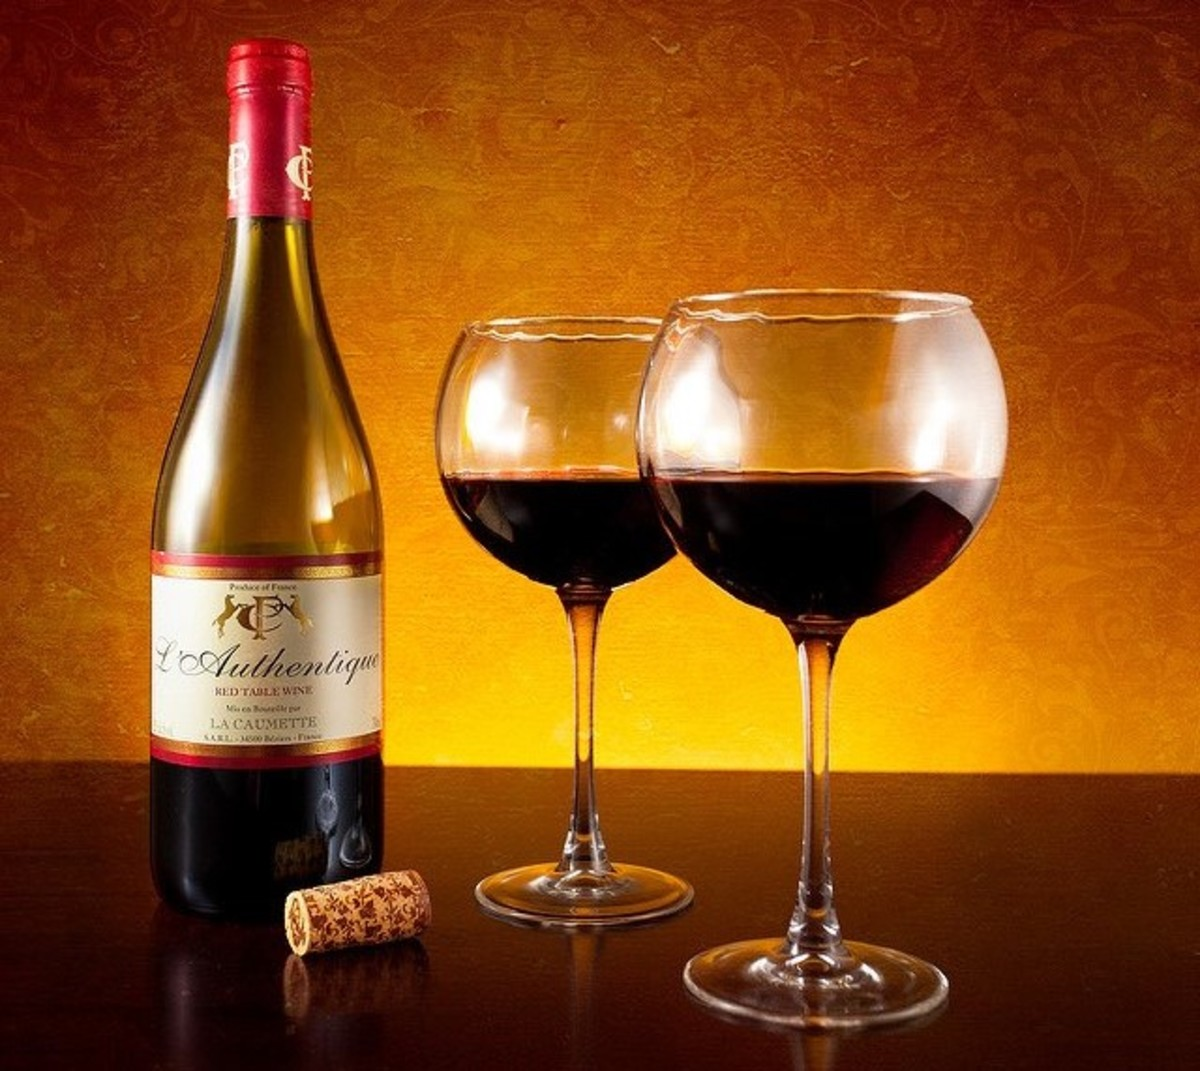 Top 5 Health Benefits of Red Wine